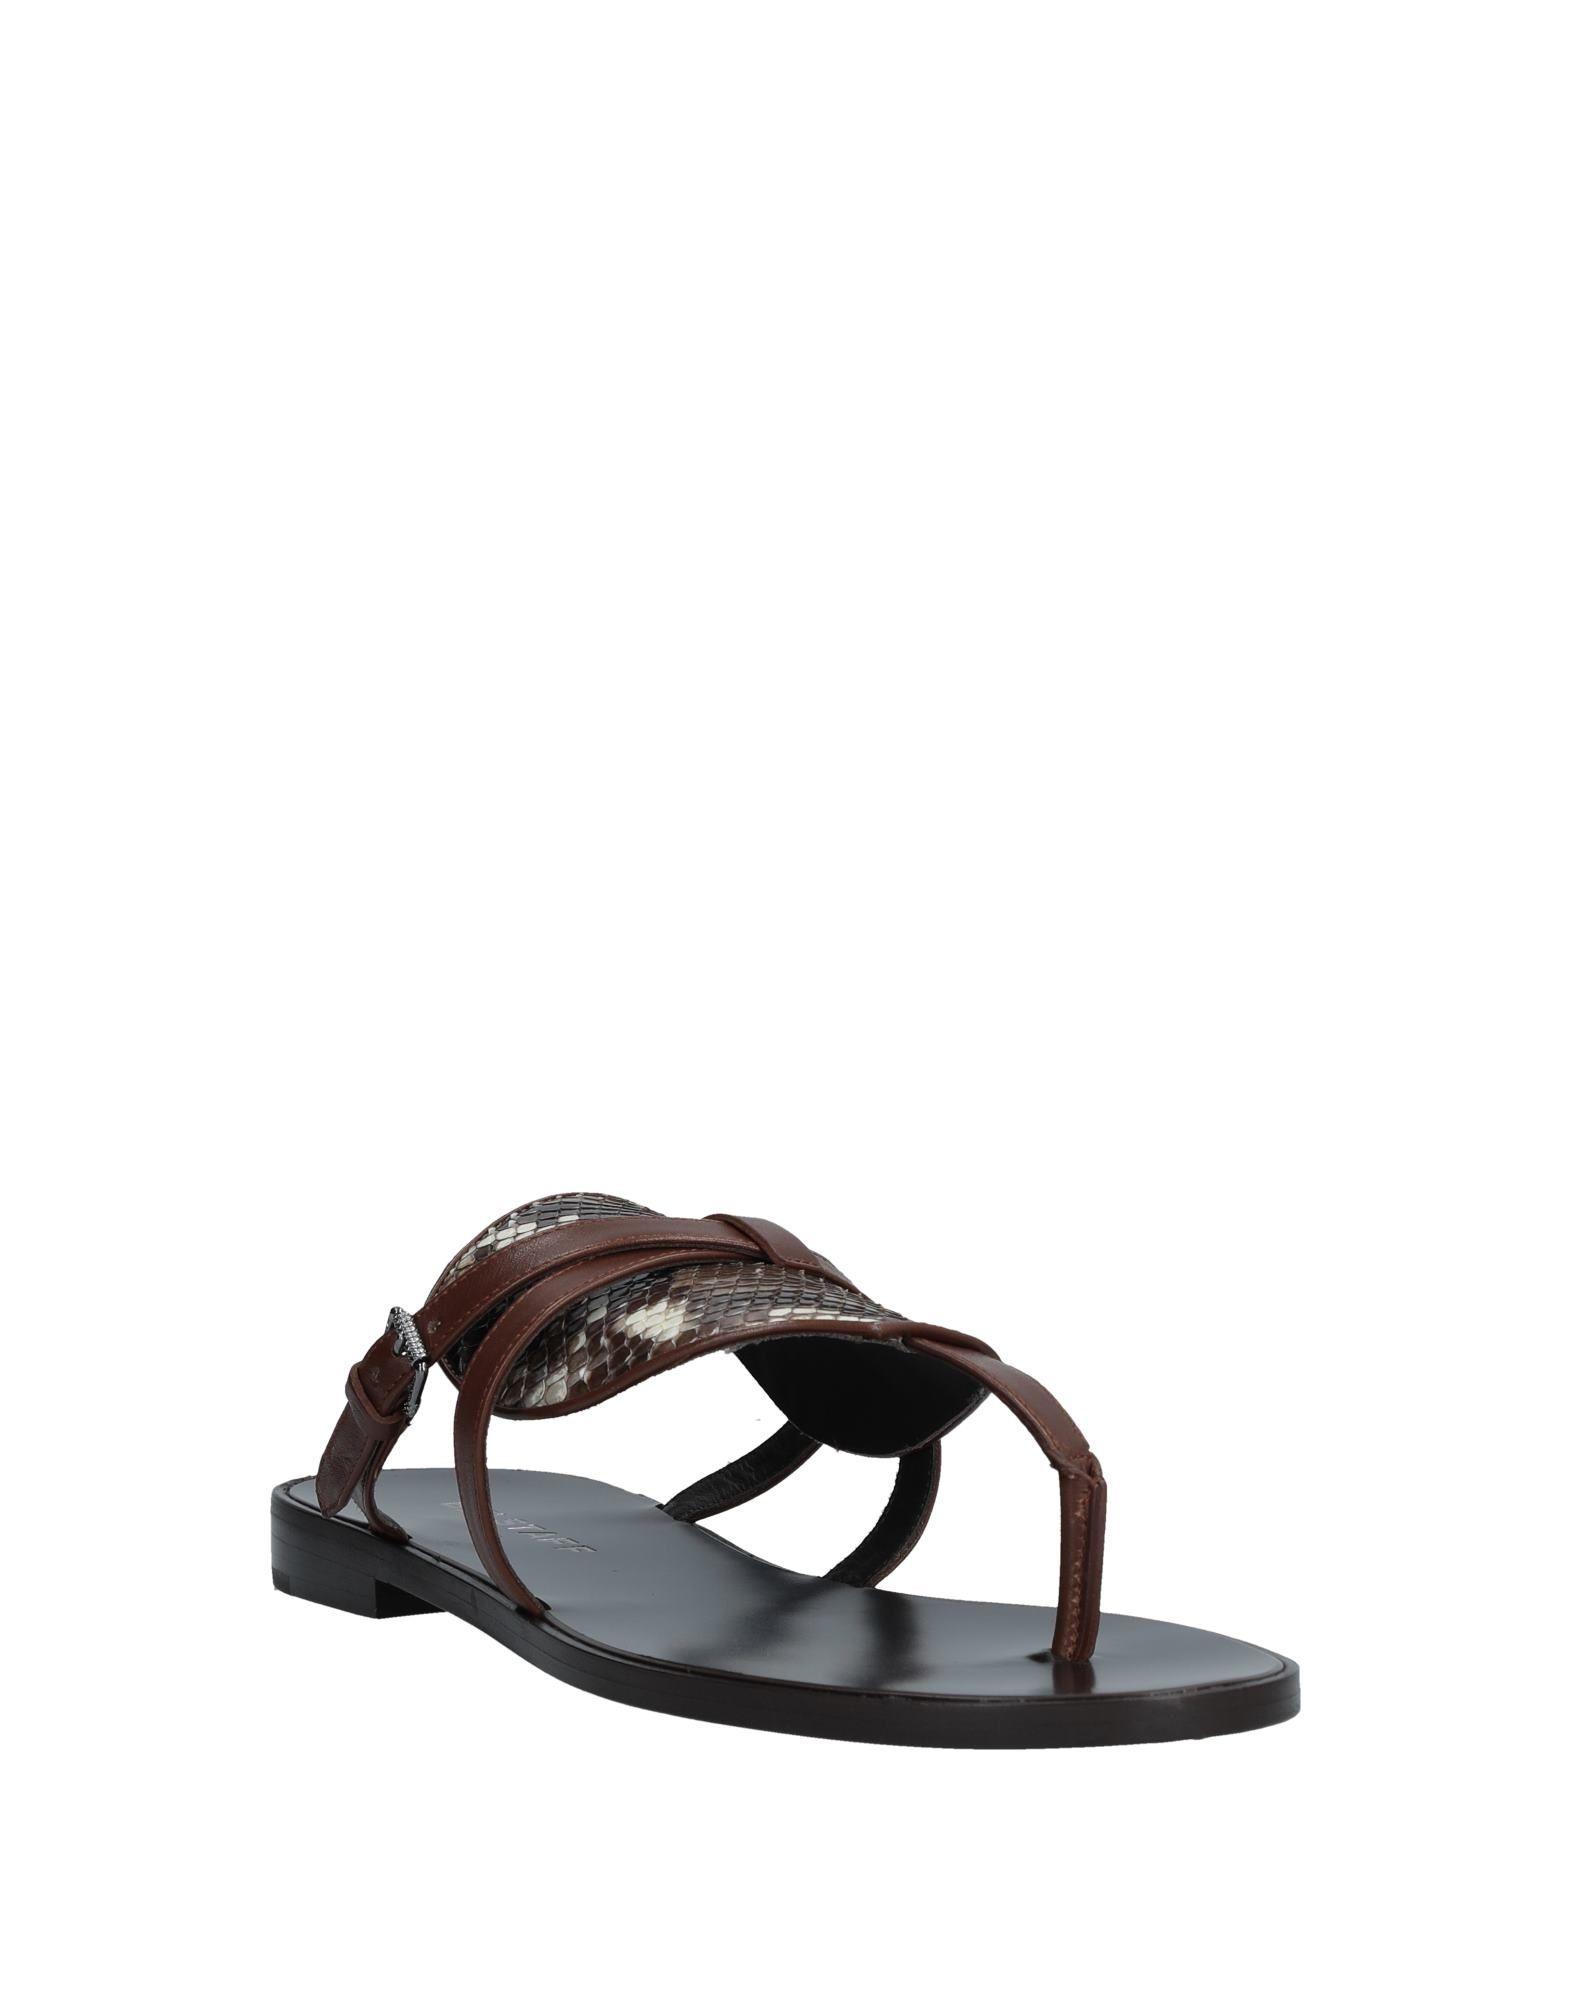 Belstaff Dianetten Damen Schuhe  11534445CKGünstige gut aussehende Schuhe Damen 46adf5